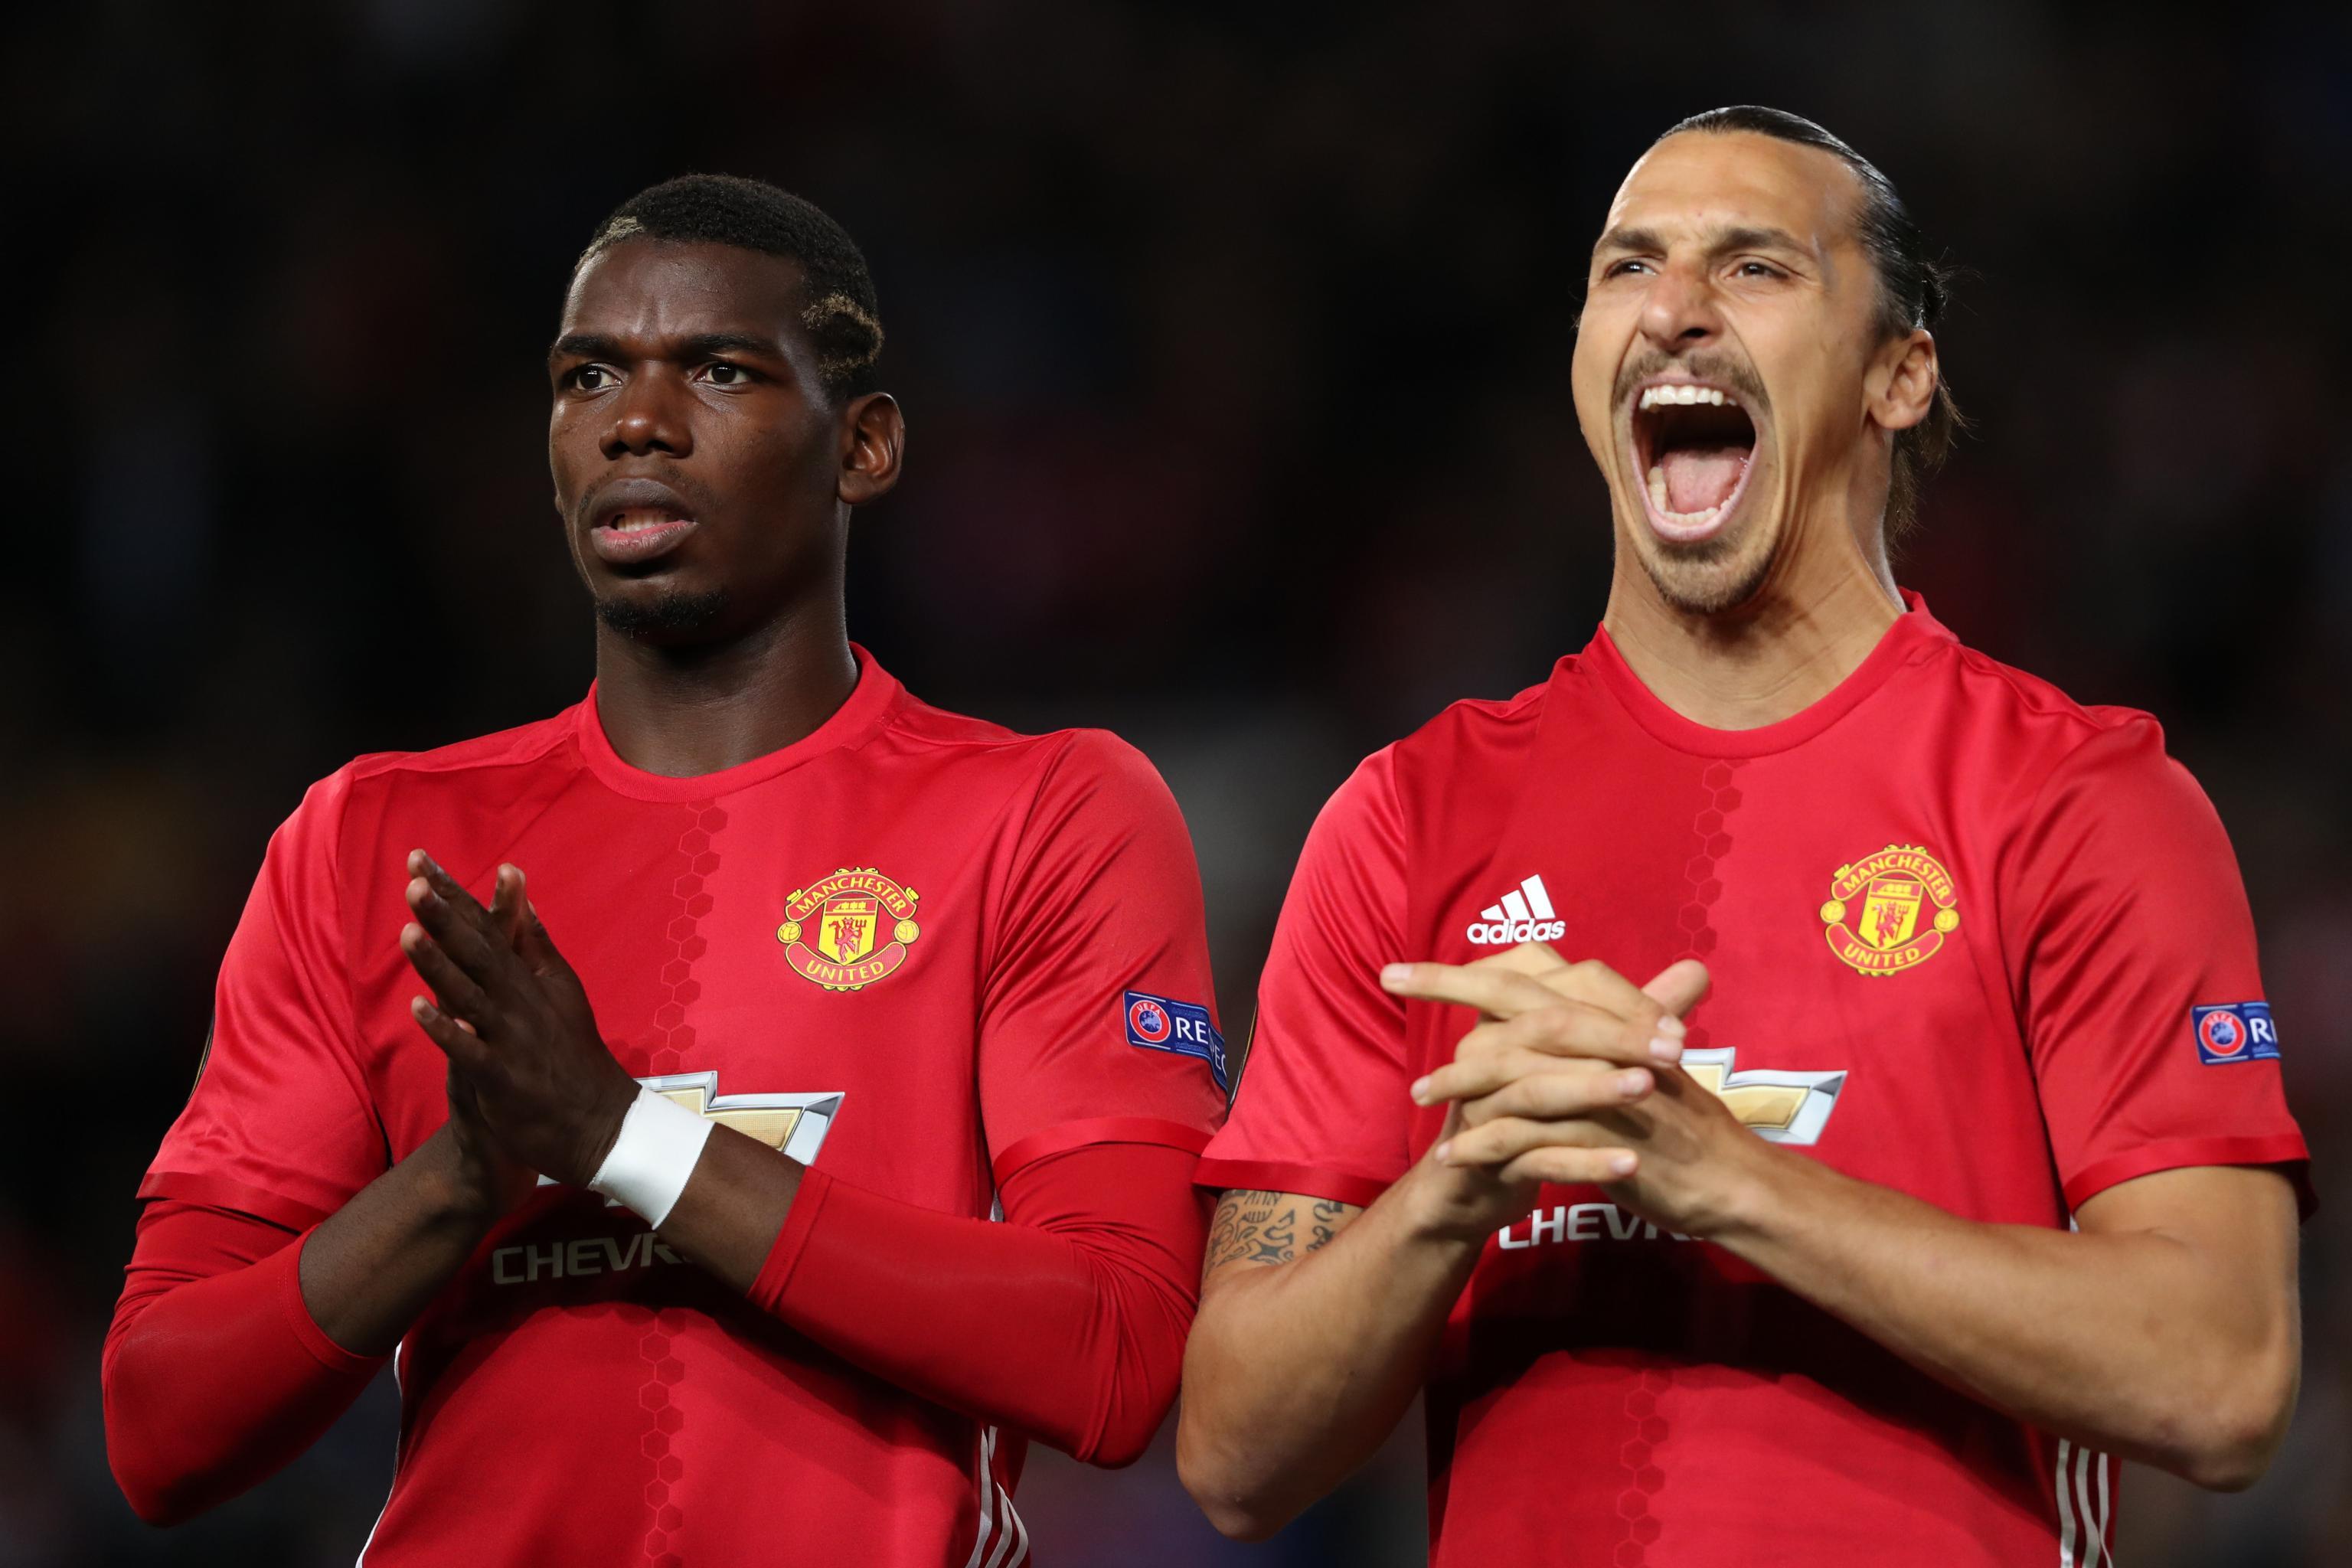 Paul Pogba Says Zlatan Ibrahimovic Can Topple Cristiano Ronaldo ...